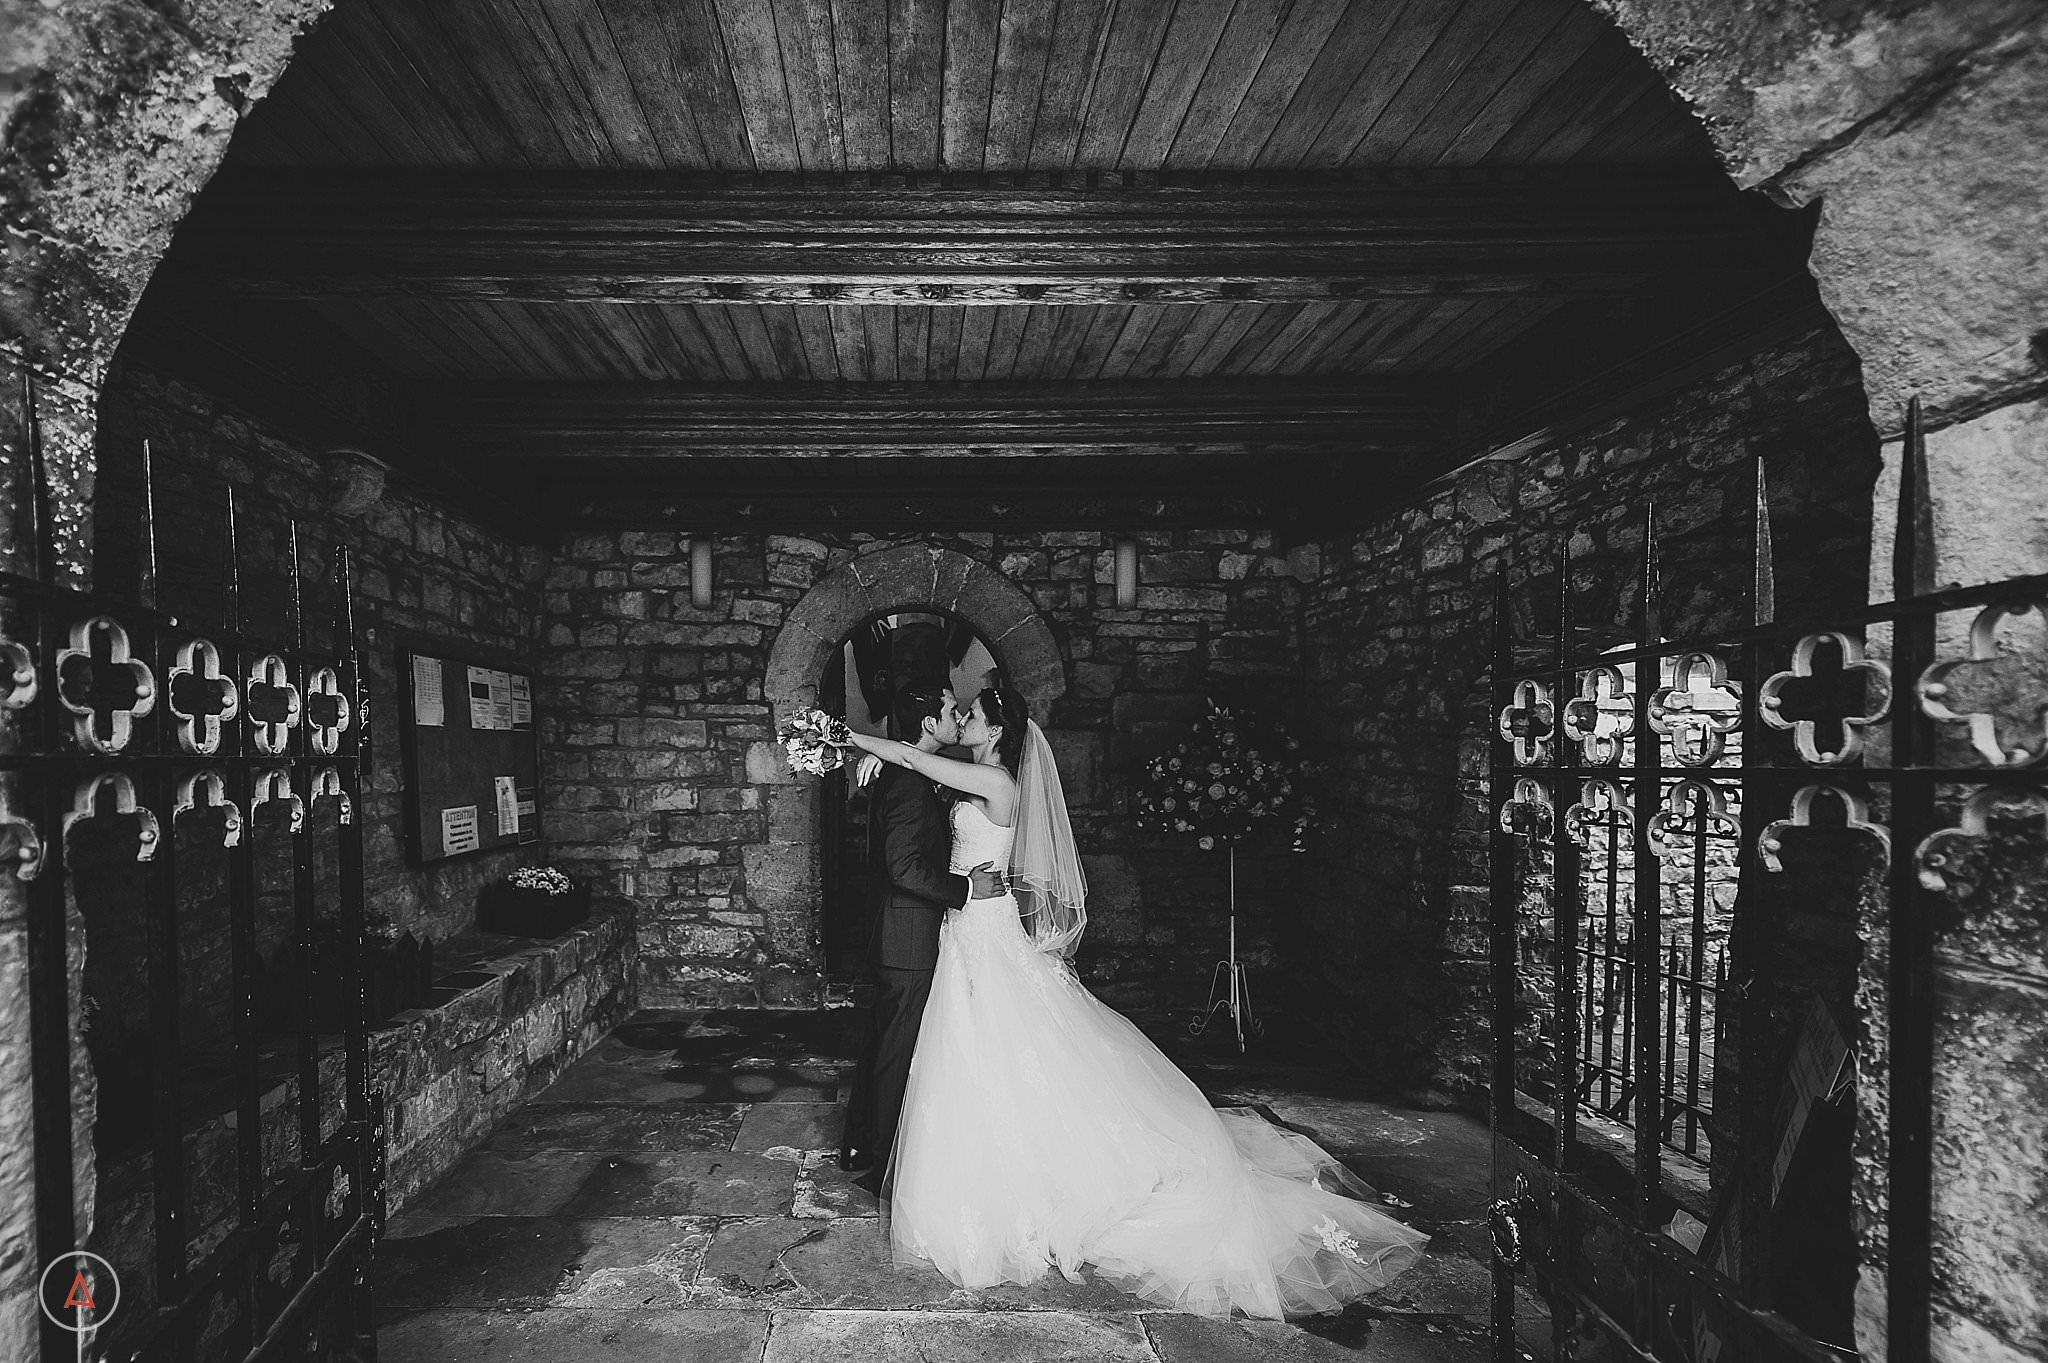 st-donats-llantwit-major-wedding-photography_0038